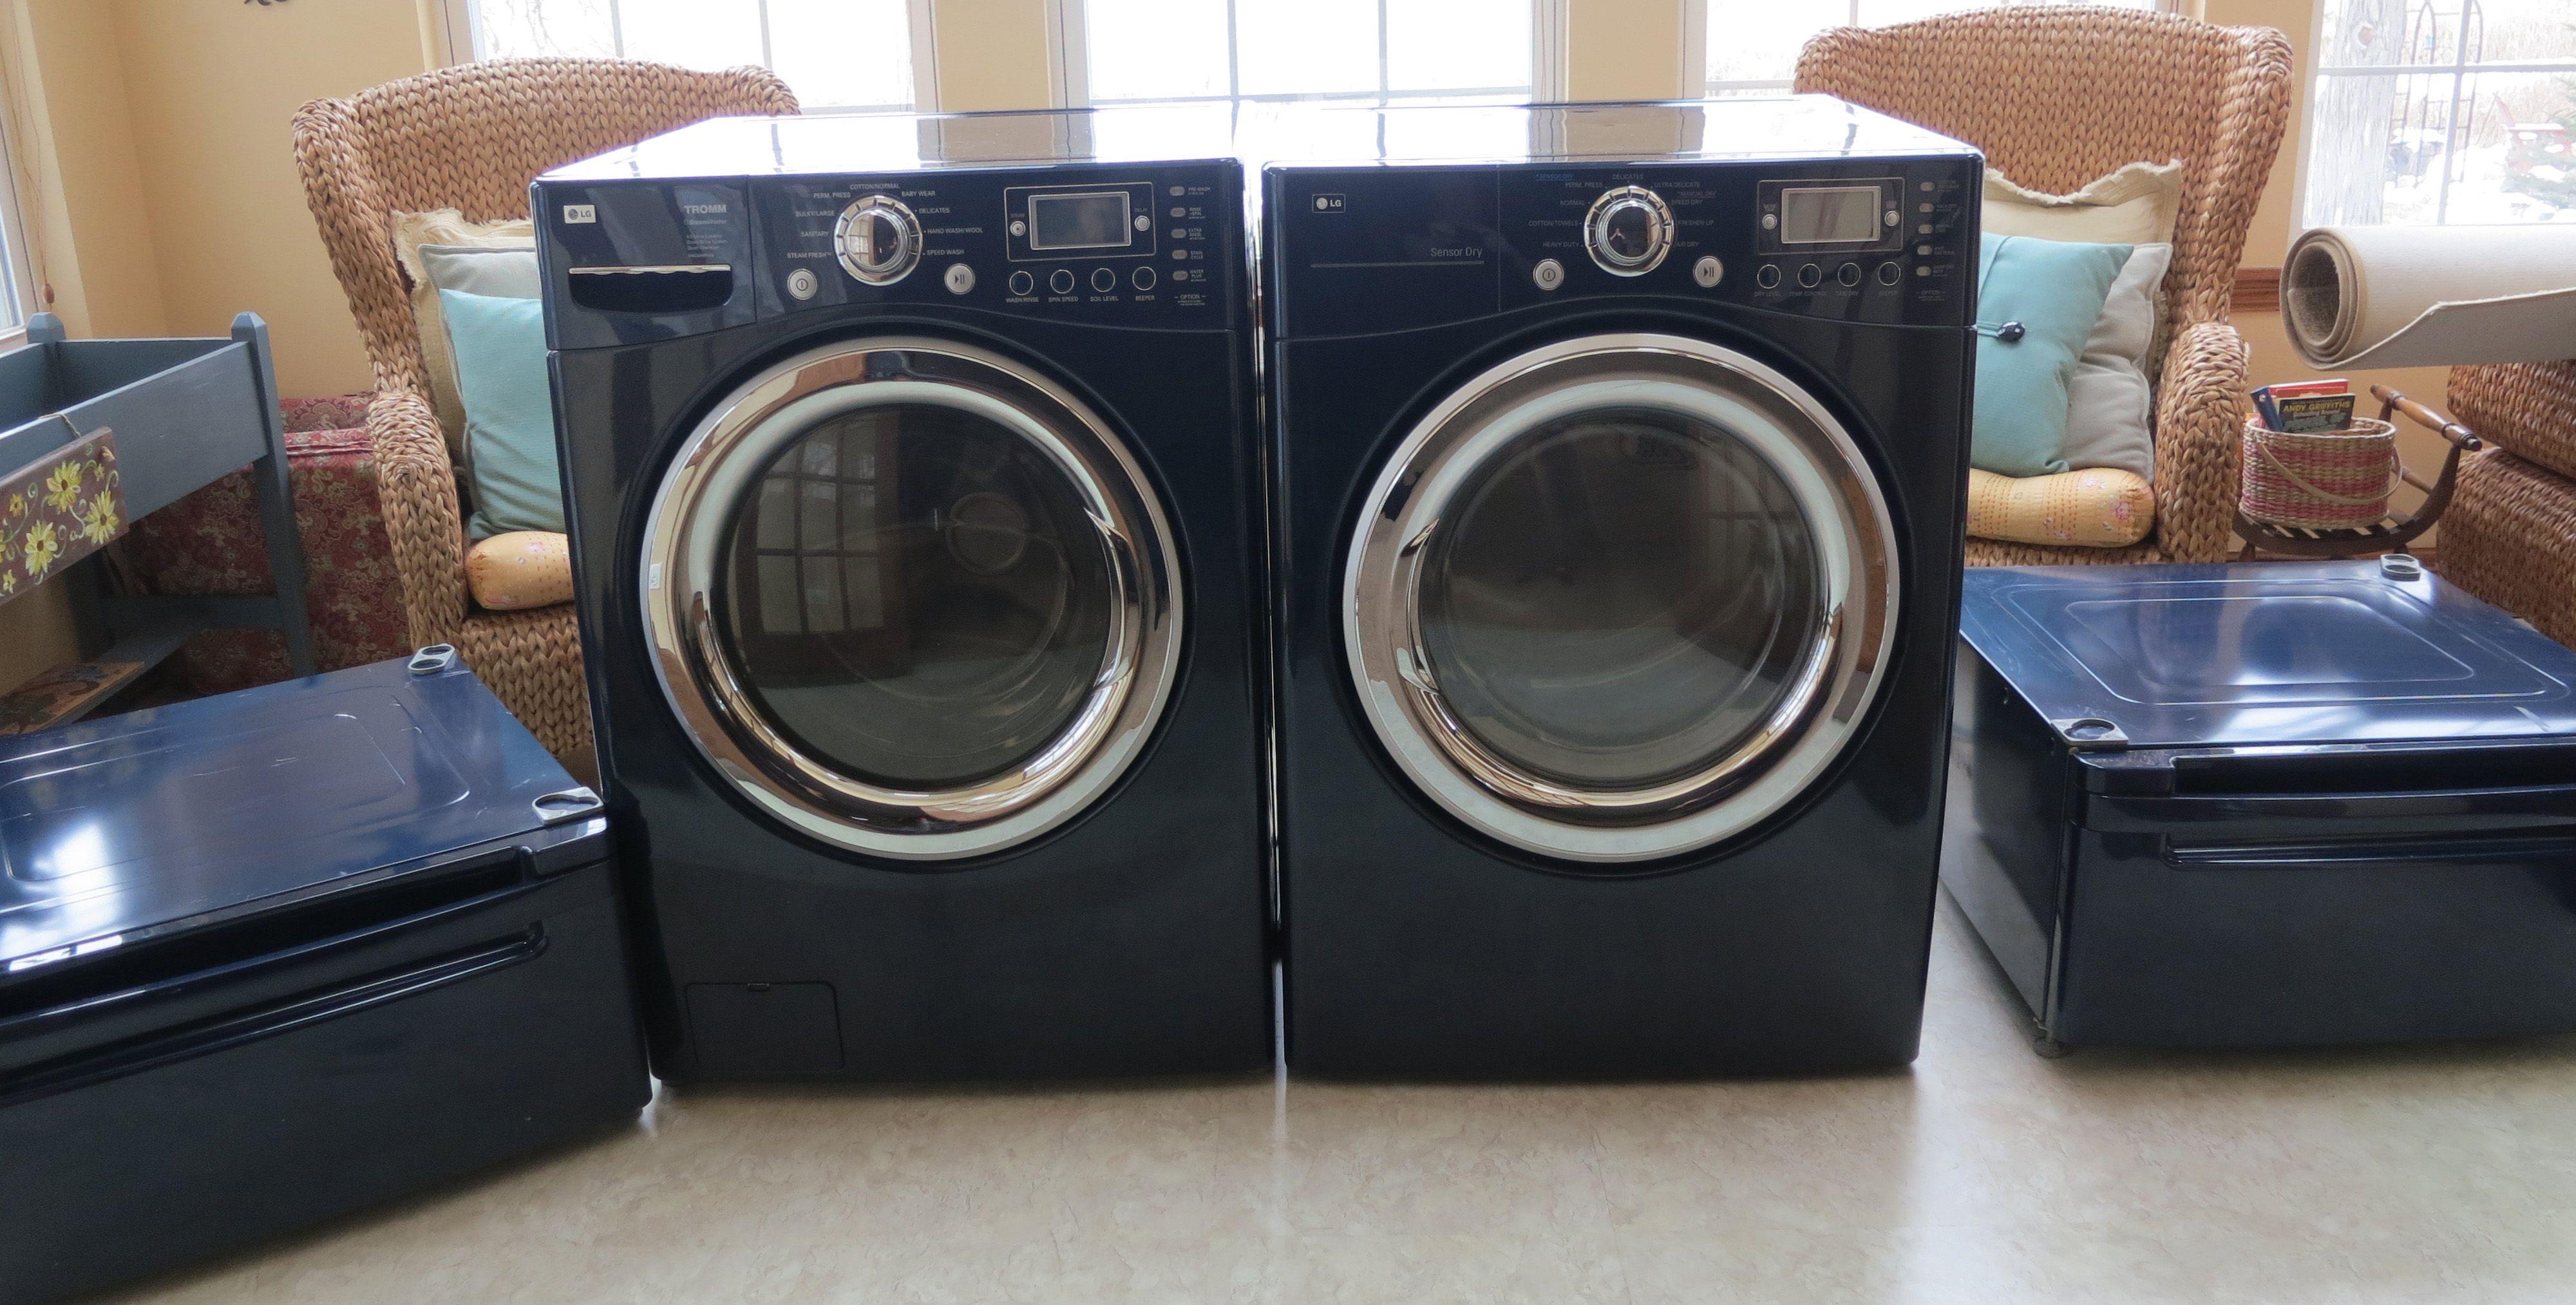 Lg Frontload Washer Dryer With Pedestals Cobalt Blue In